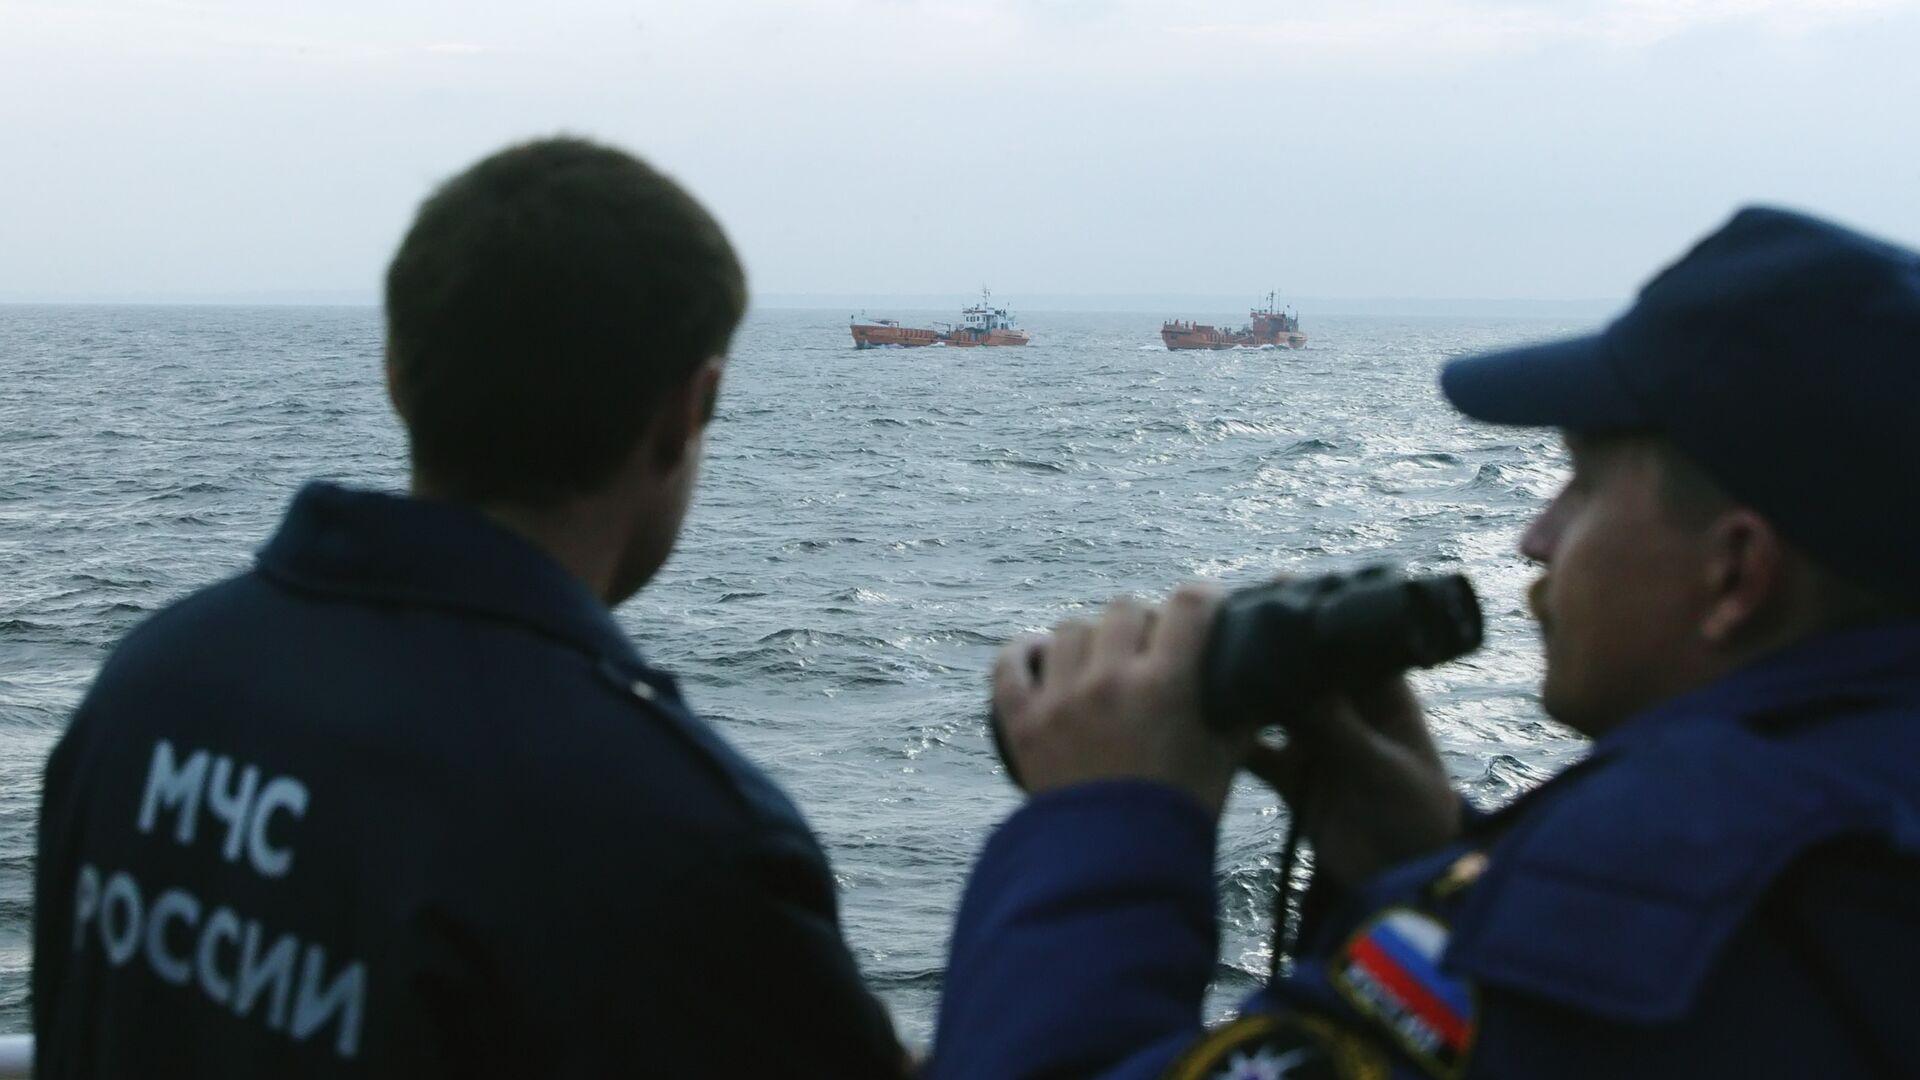 На реке Амур в Хабаровском крае столкнулись два катера